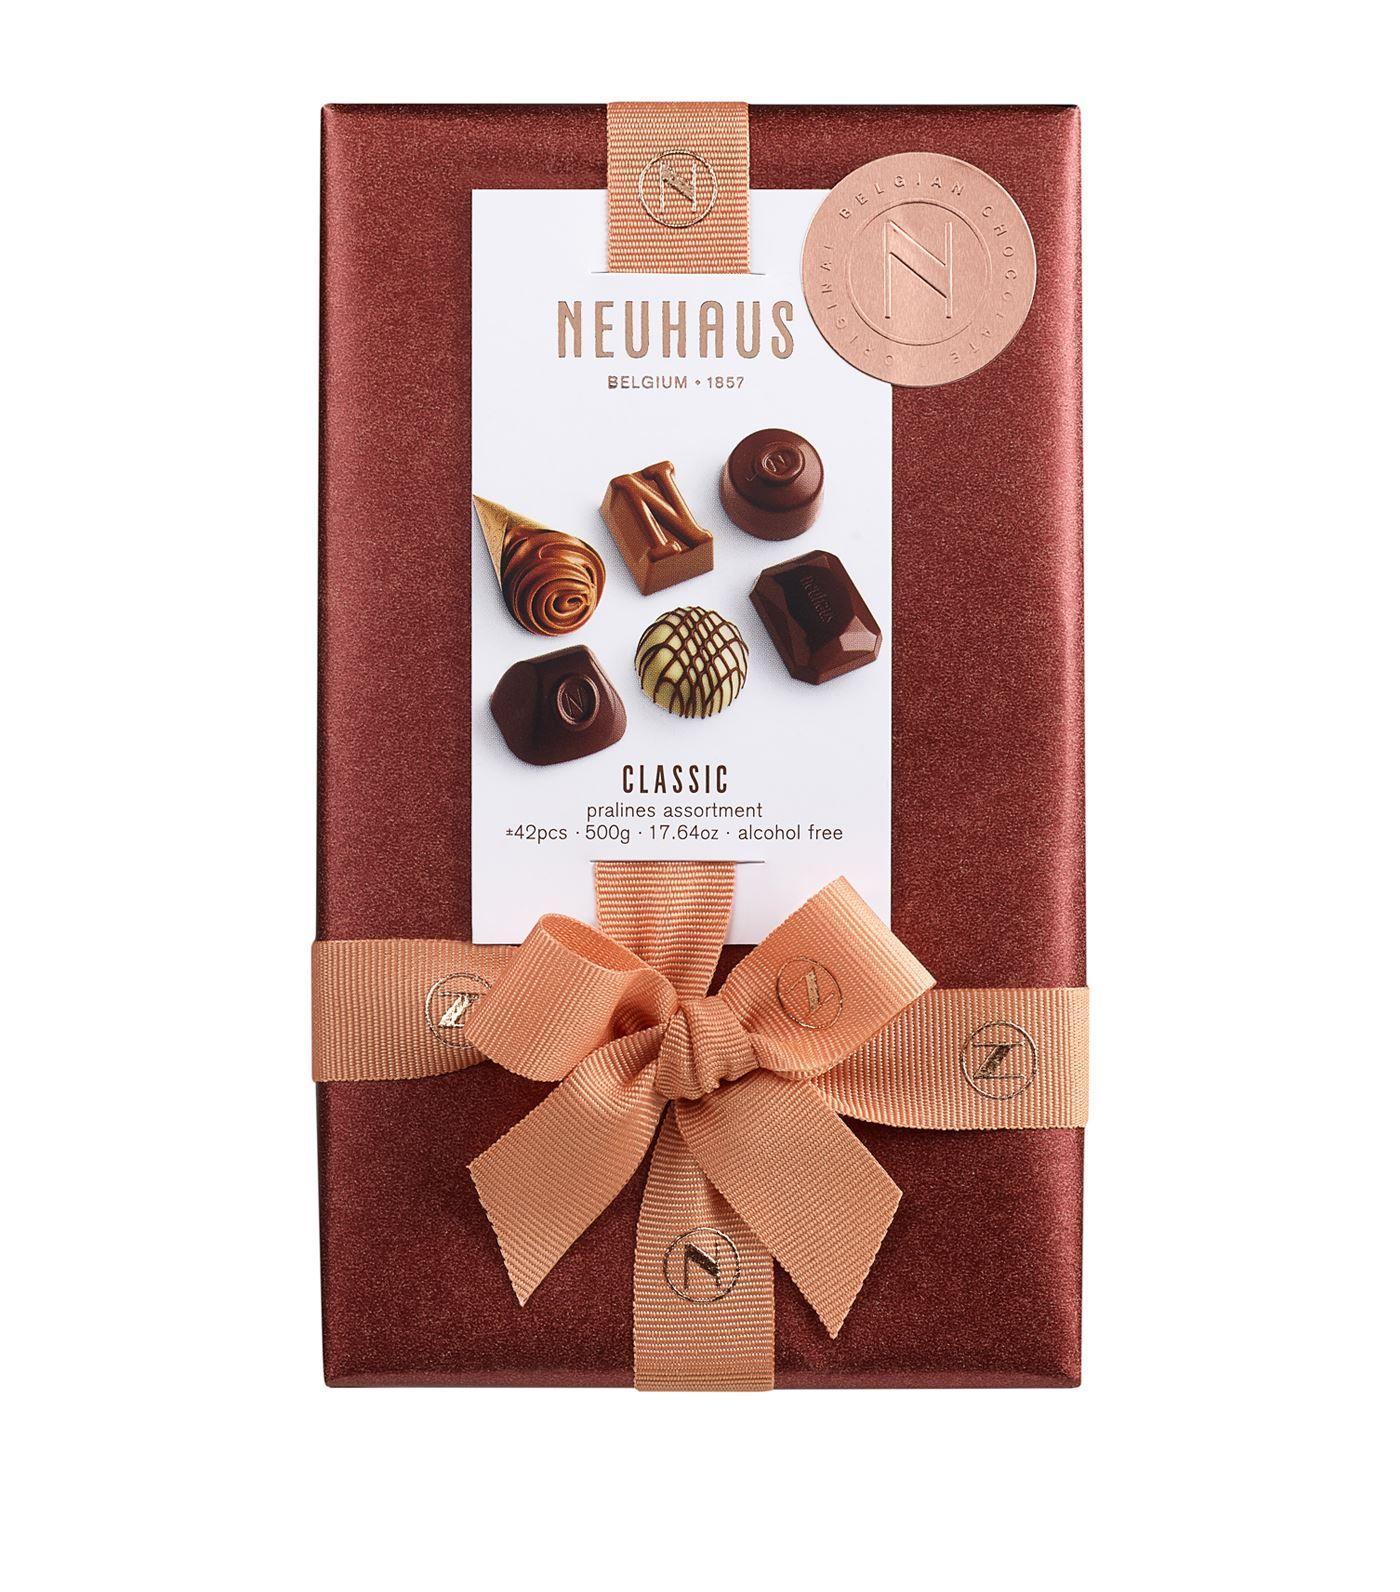 Neuhaus Classic Ballotin Chocolates 500g Ad Affiliate Classic Neuhaus Ballotin Chocolates Chocolate Stores Pralines Chocolate Lovers